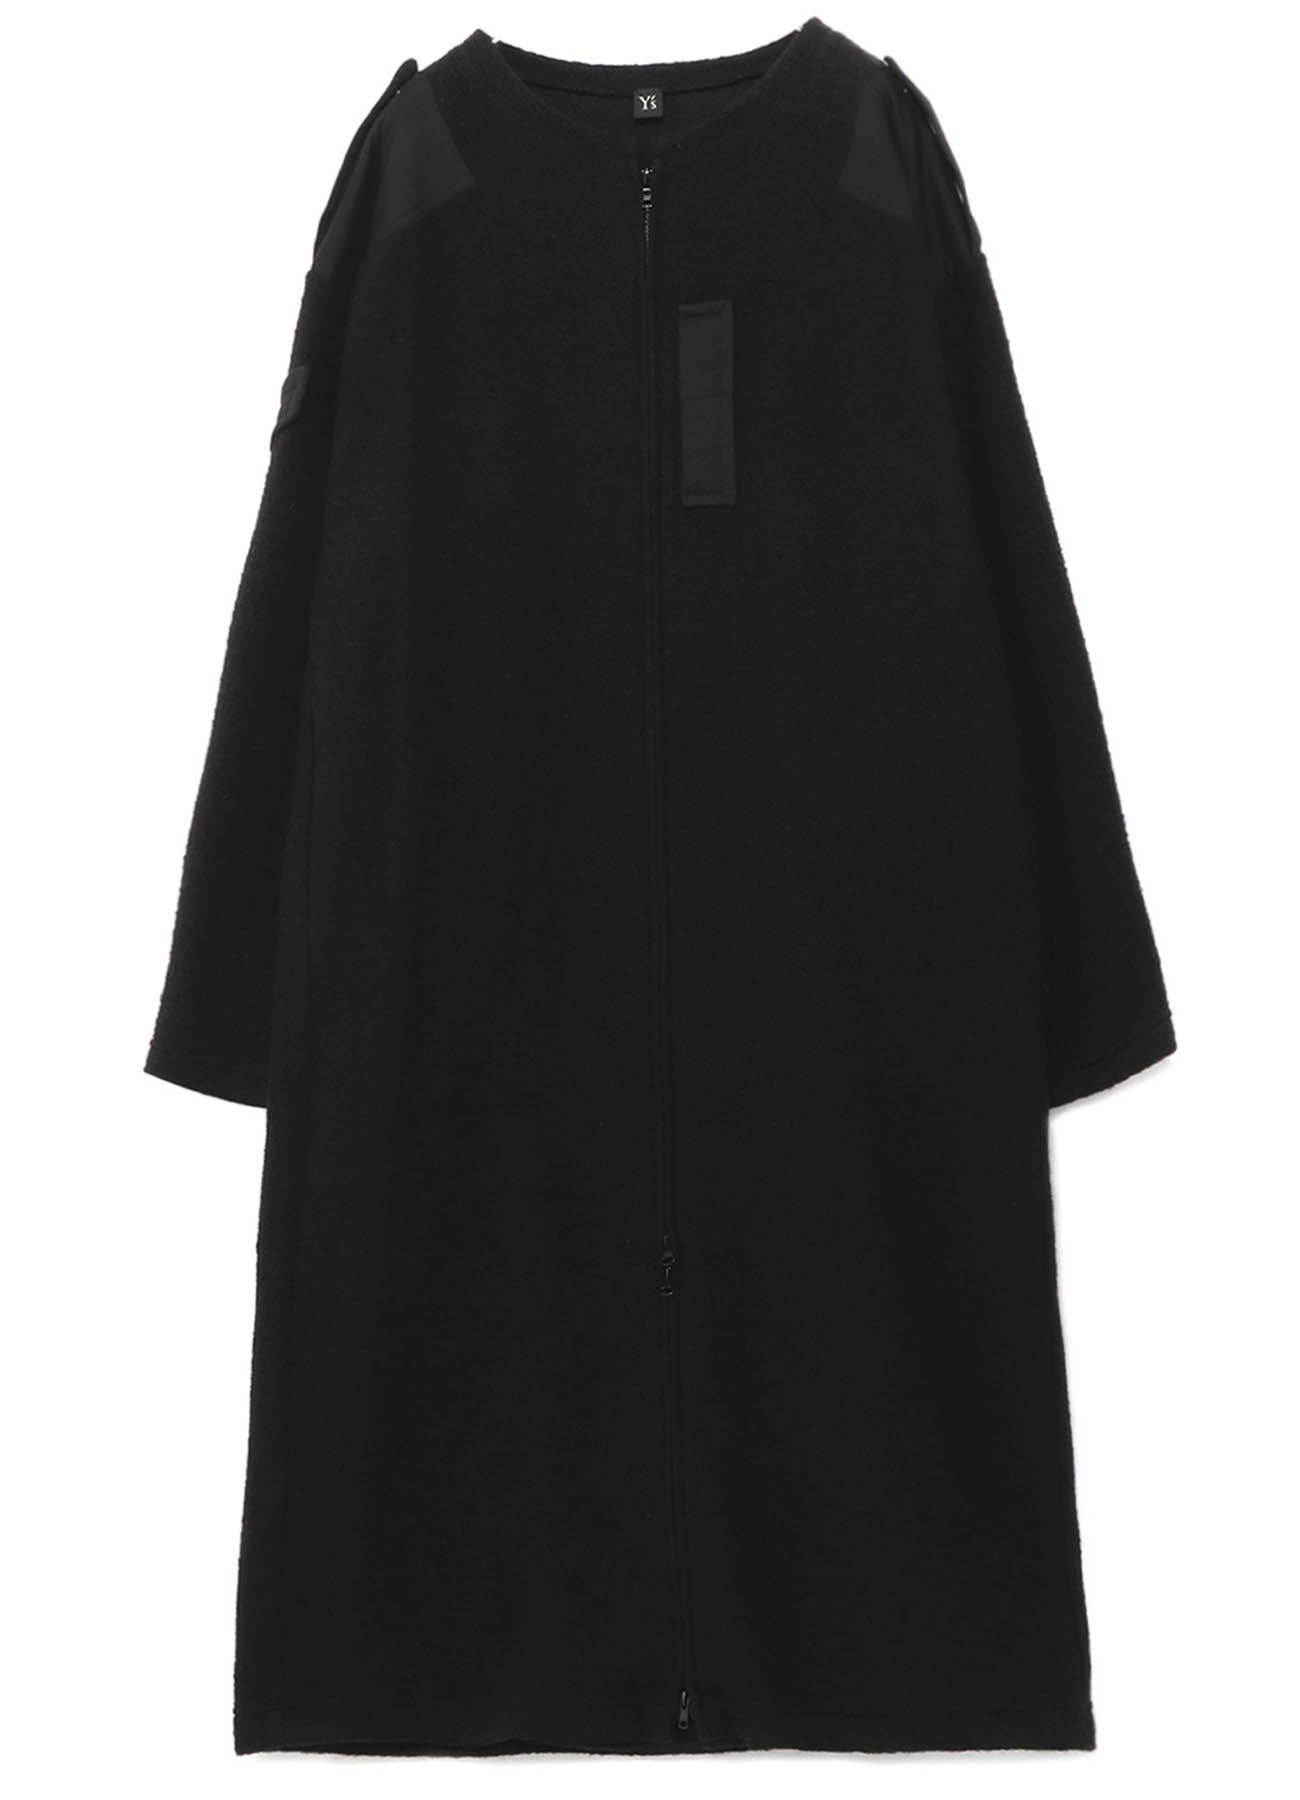 LIGHT MOLE SKIN x ITALIAN AIRY MOHAIR COLLARLESS DRESS